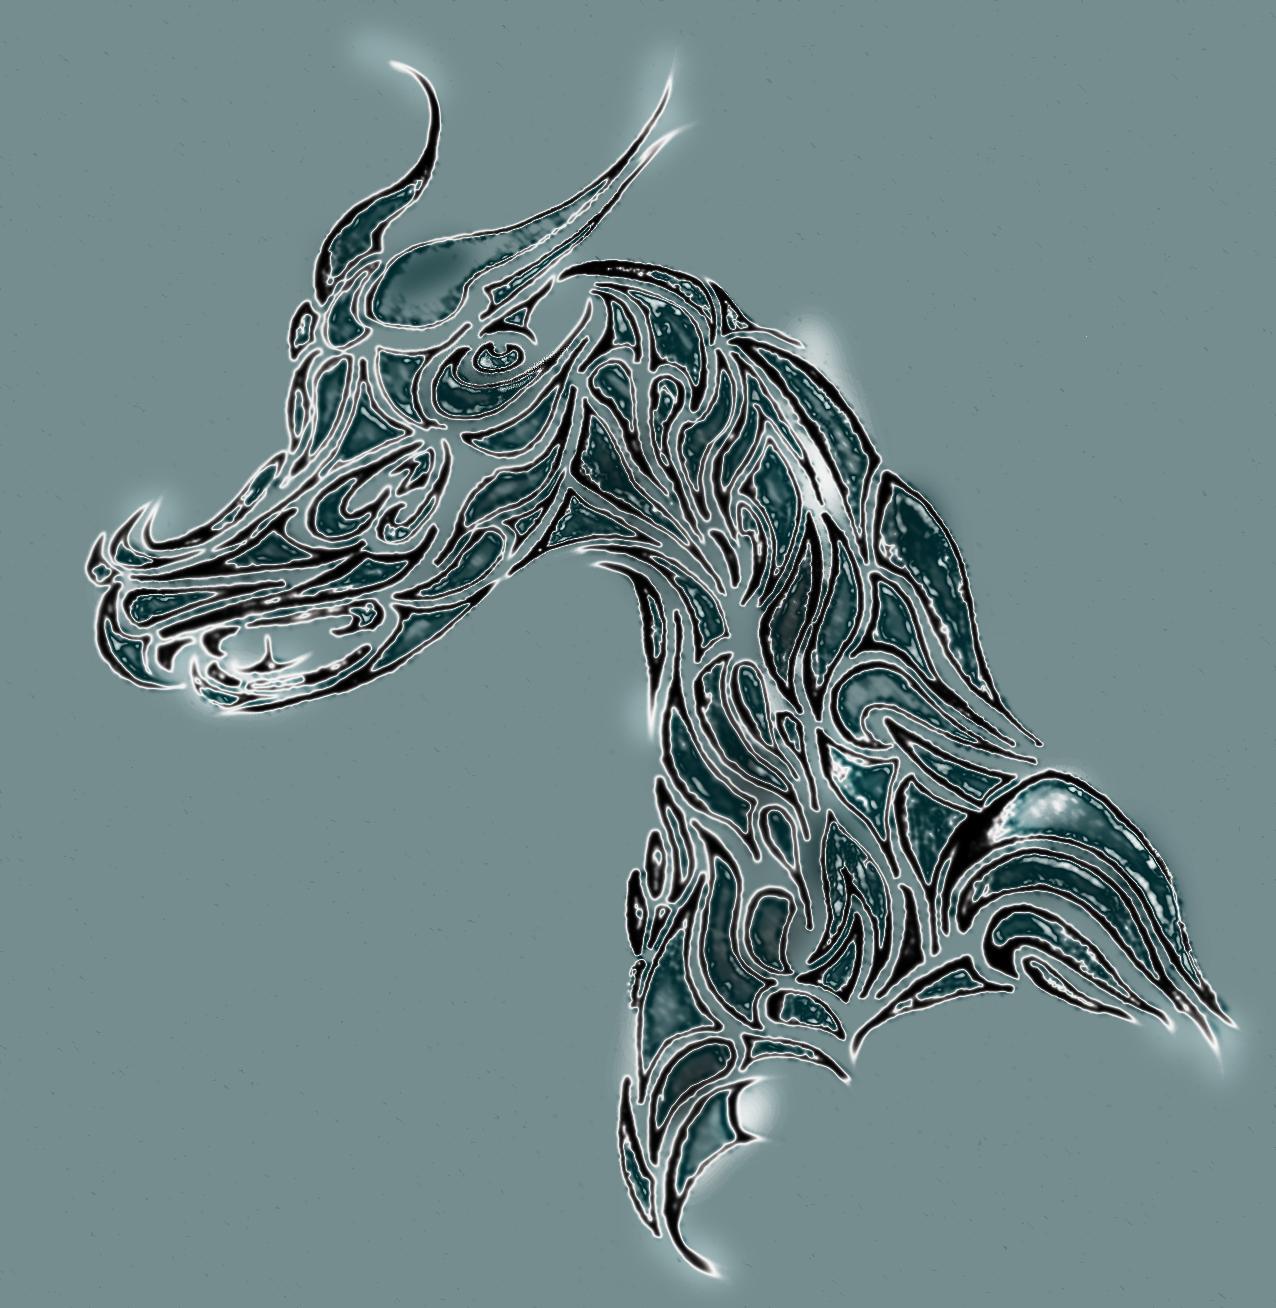 Dragon Tattoo Photoshop edit